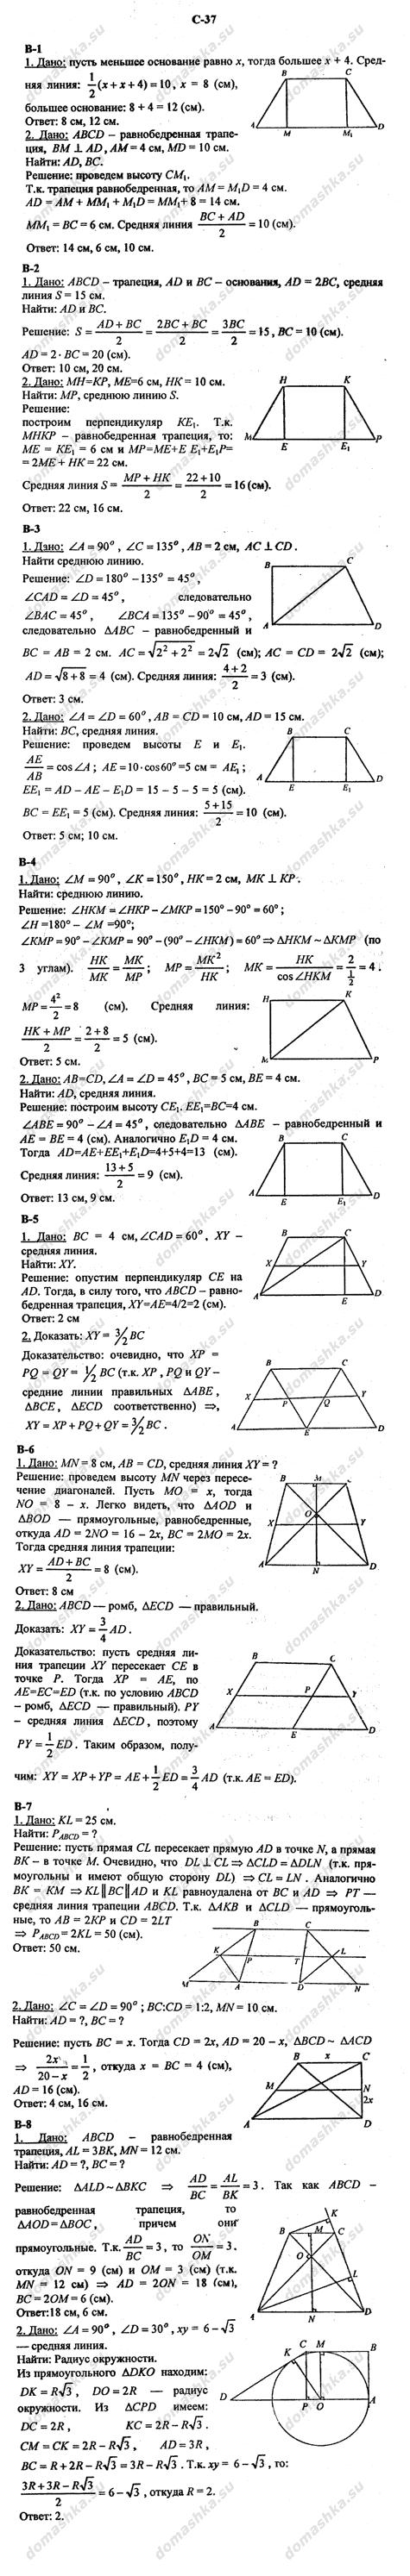 Уроки геометрии 7-11 классы зив.б.г 1998 гдз